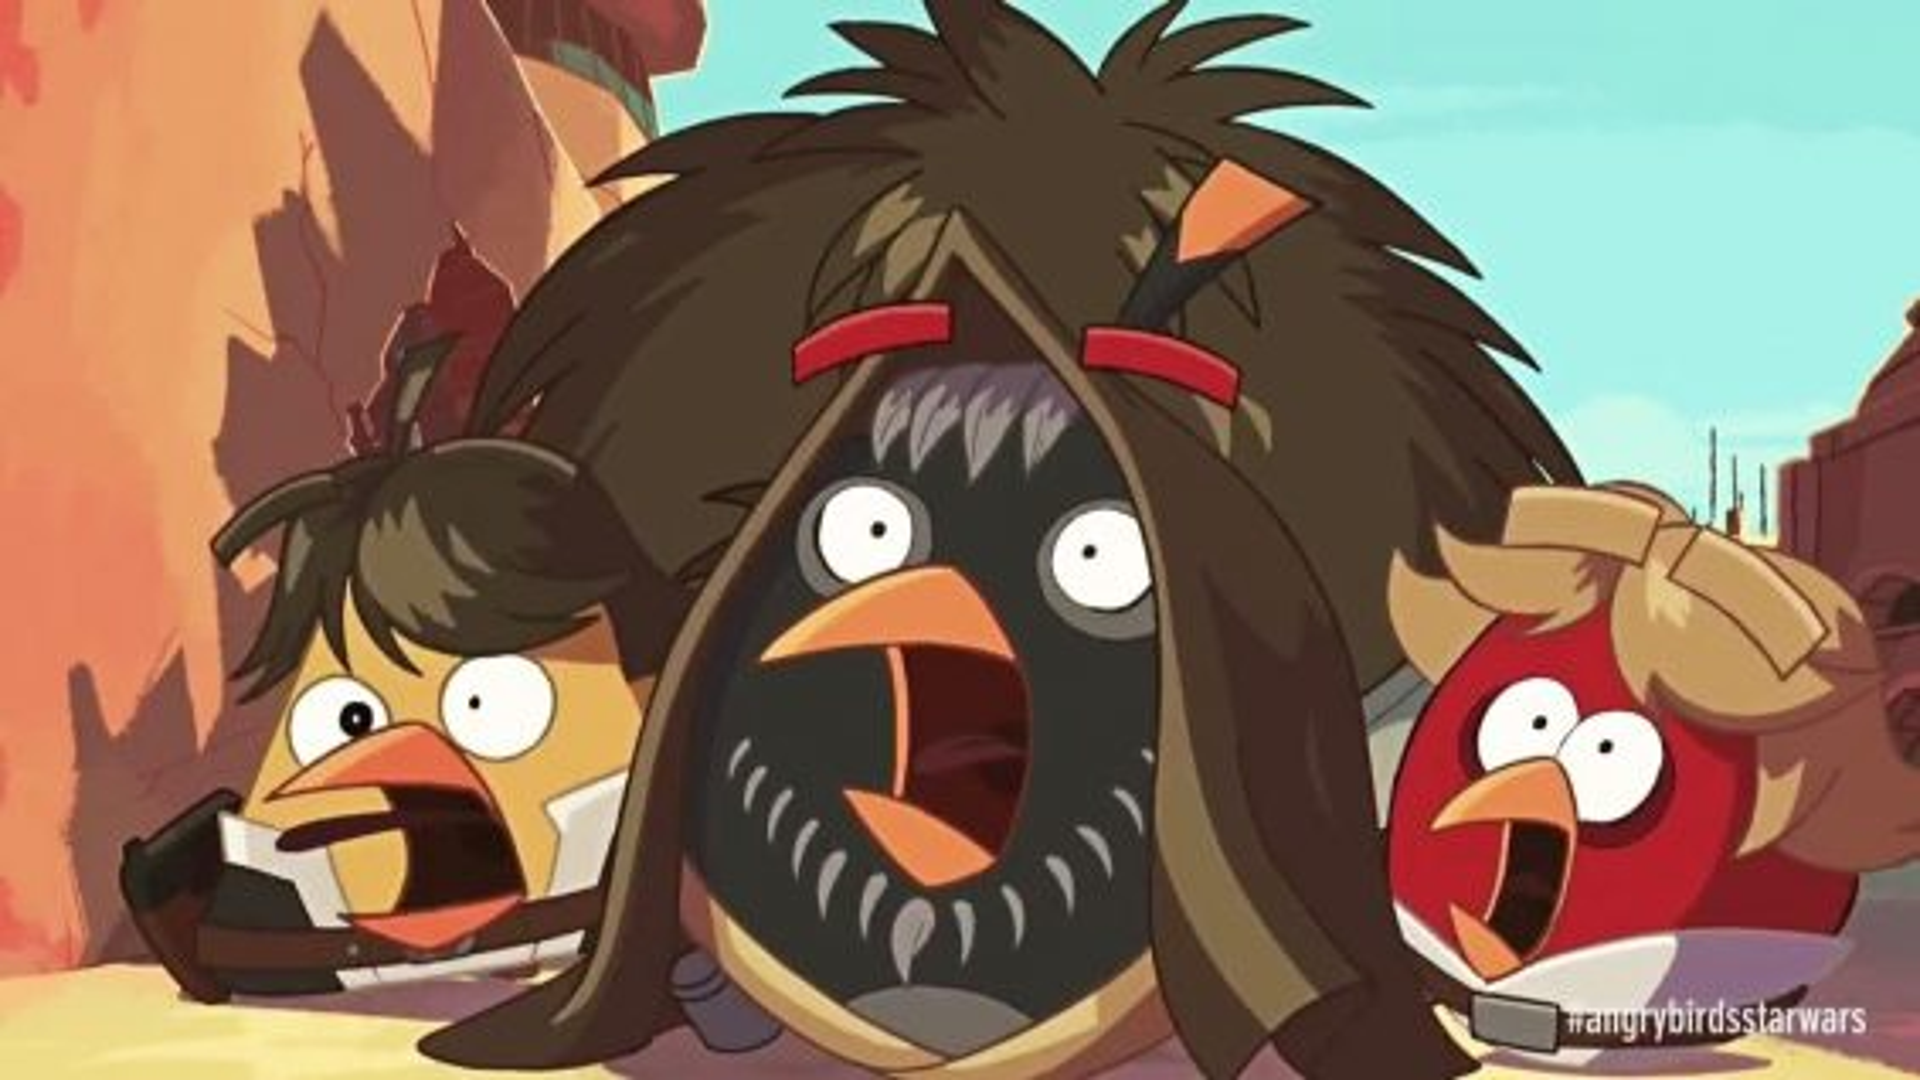 کارتون انگری بردز؛ این قسمت جنگ ستارگان | فیلم